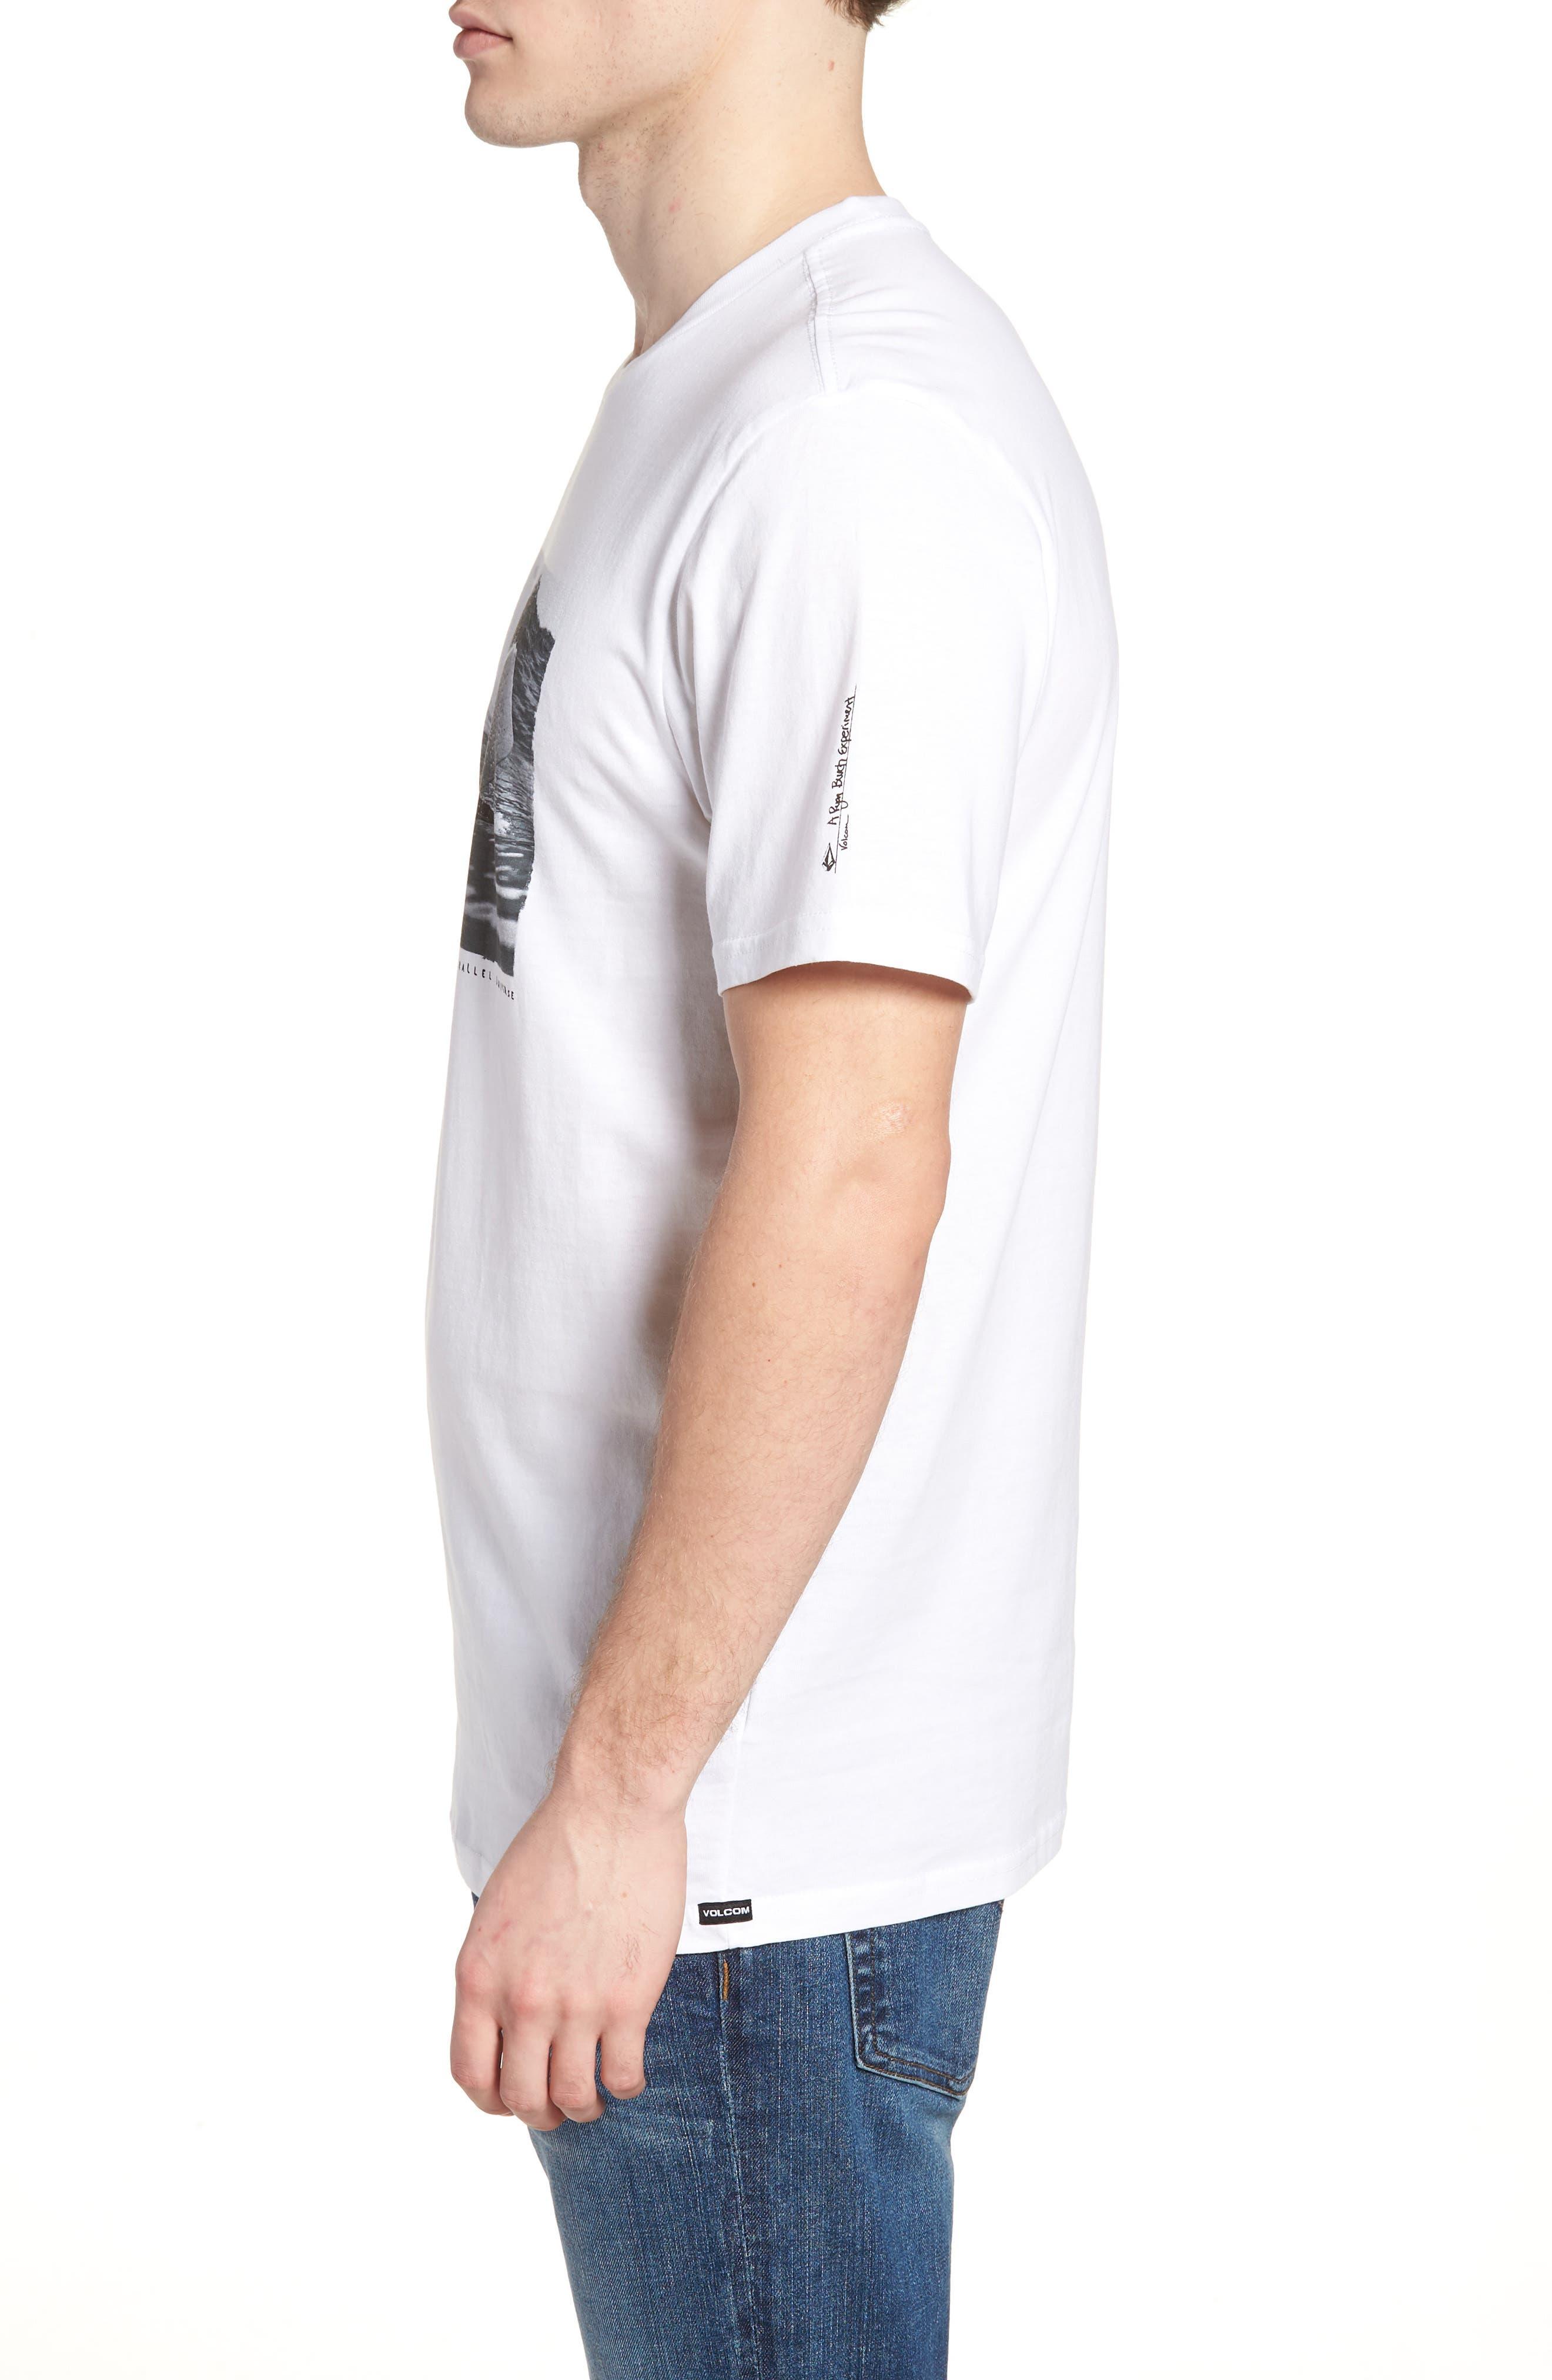 Burch Foam Graphic T-Shirt,                             Alternate thumbnail 3, color,                             100